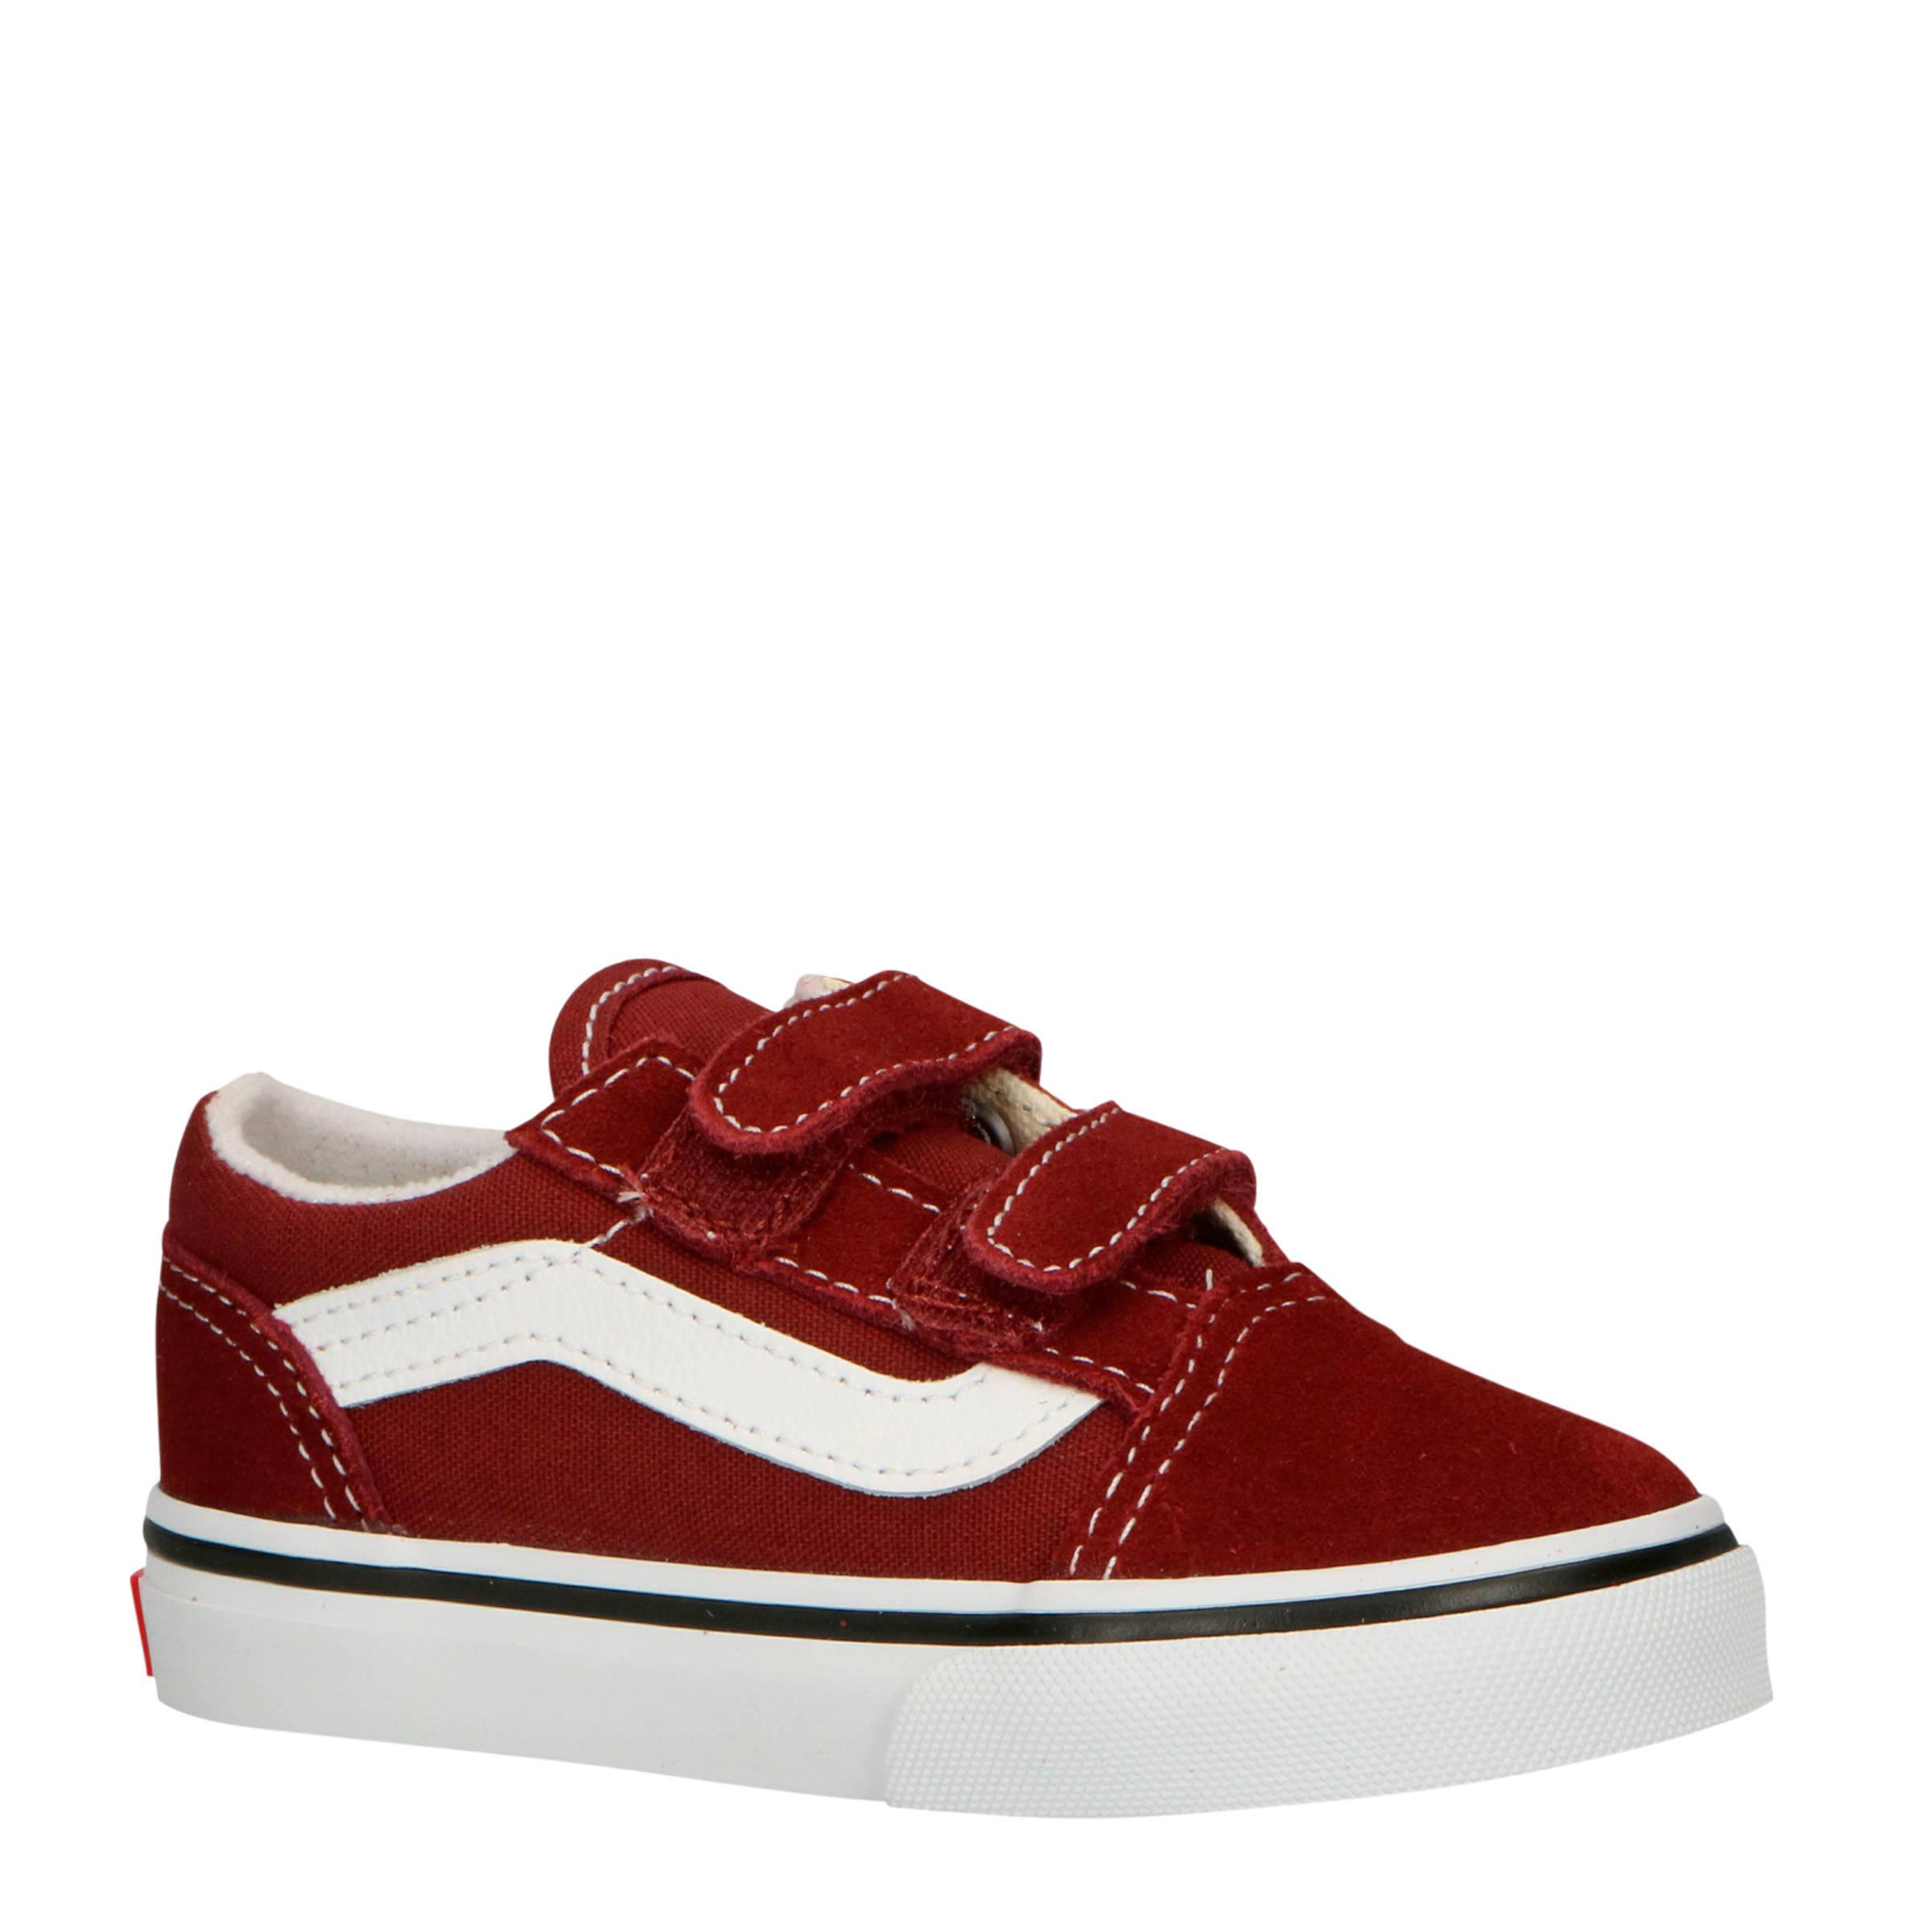 TD Old Skool V sneakers donkerroodwit